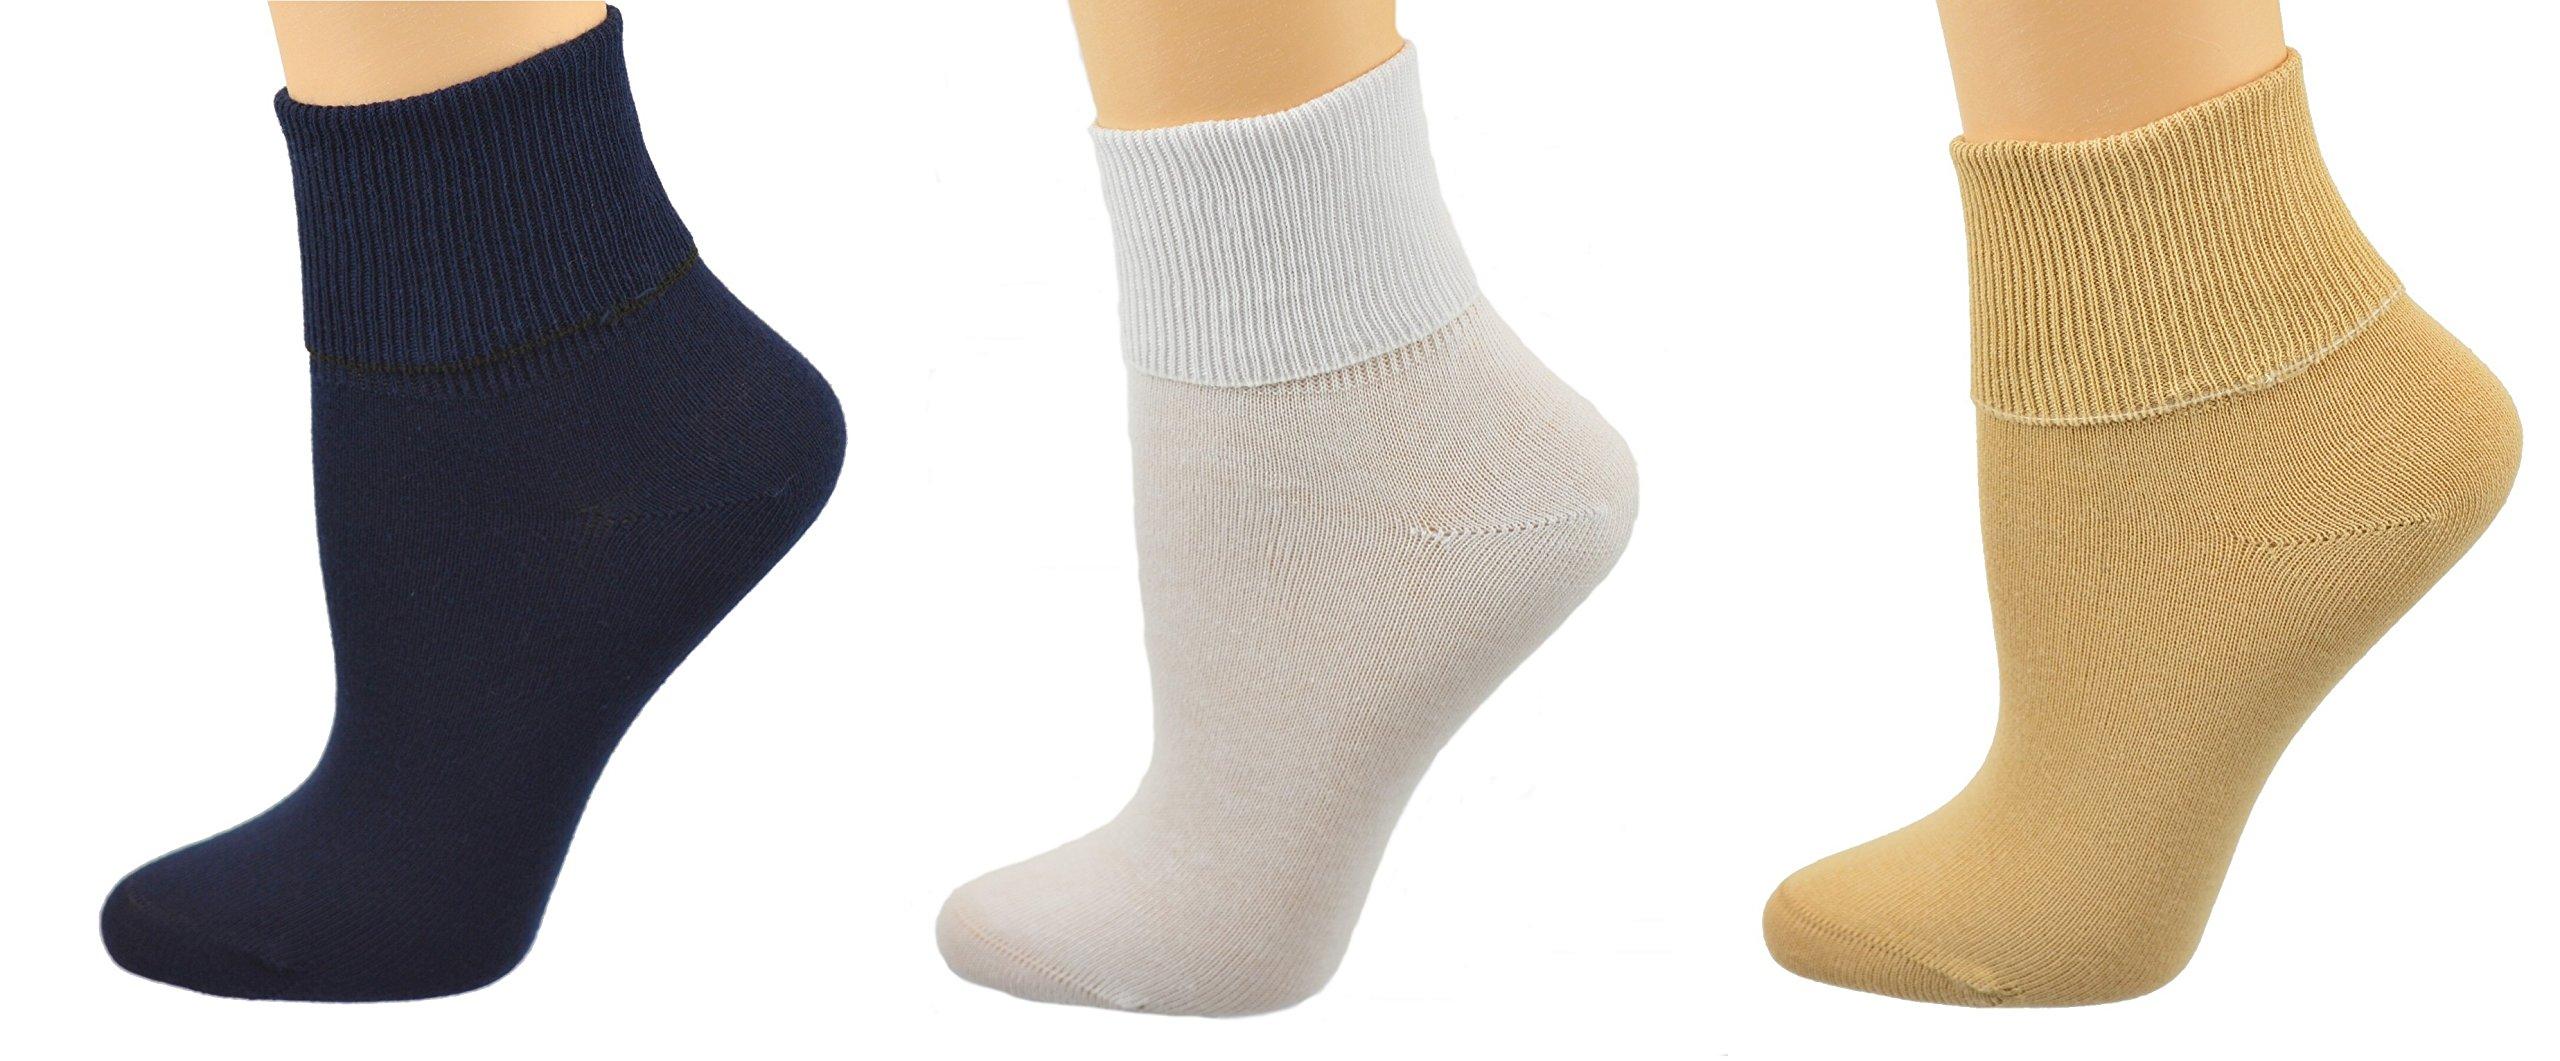 Sierra Socks Women's Diabetic 100% Cotton Ankle Turn Cuff 3 Pair Pack (9, Navy/Khaki/White)